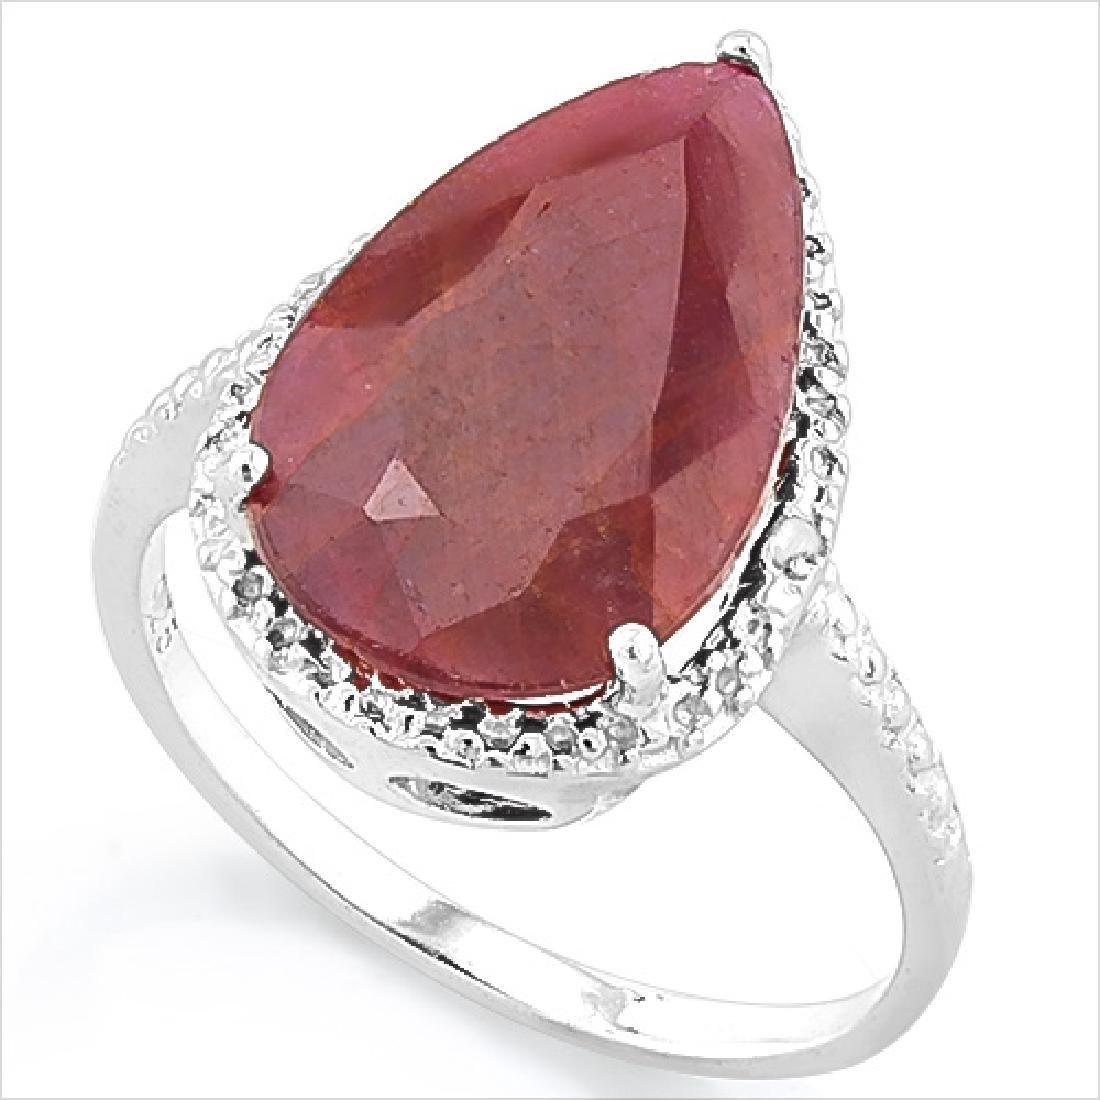 HUGE 6CT RUBY/DIAMOND GENUINE PEAR CUT SOLITARE RG